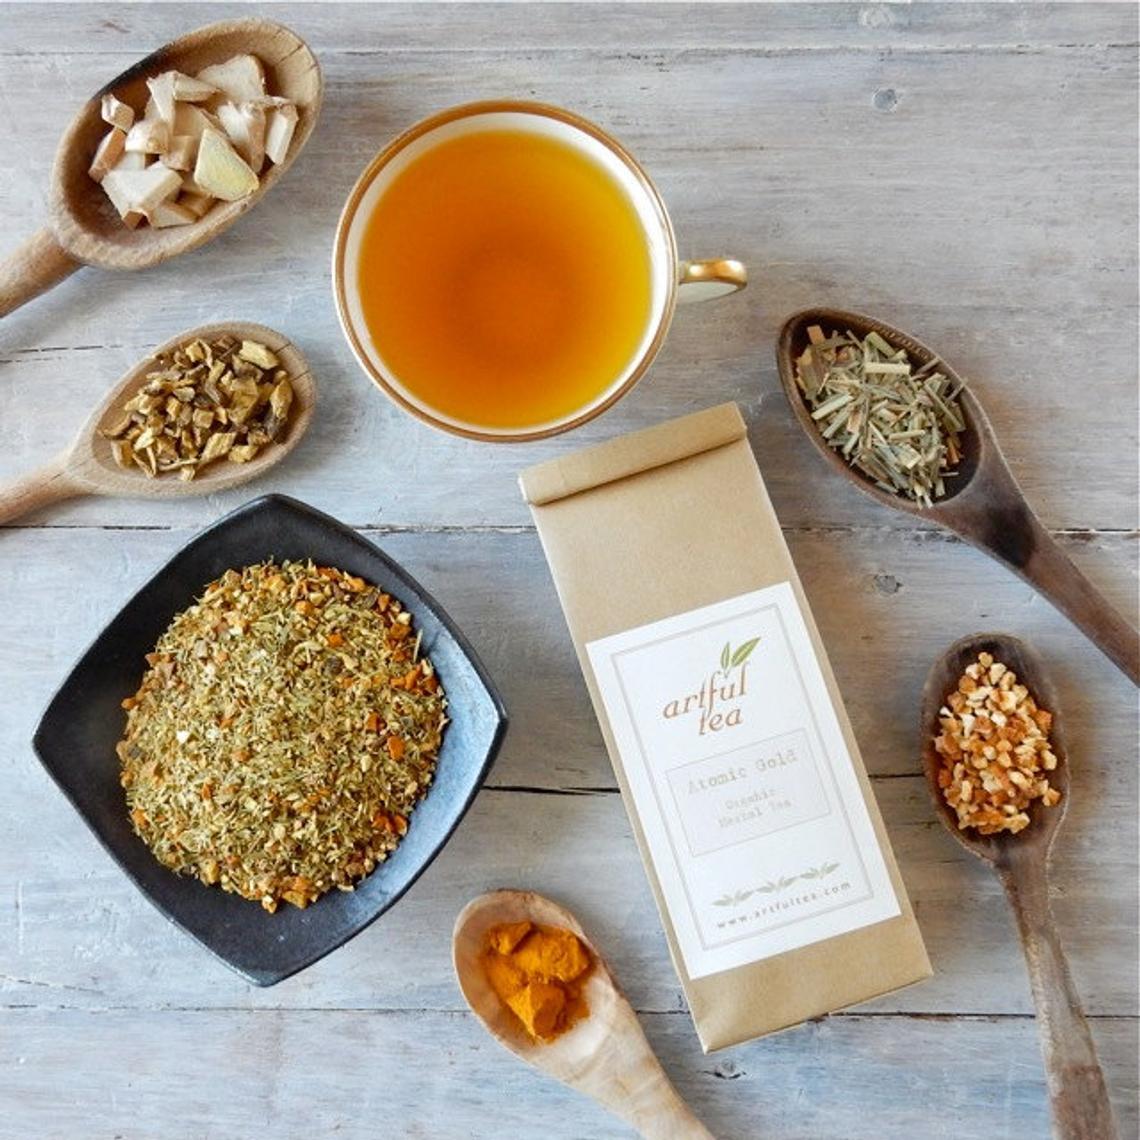 Atomic Gold Organic Herbal Tea By ArtfulTea